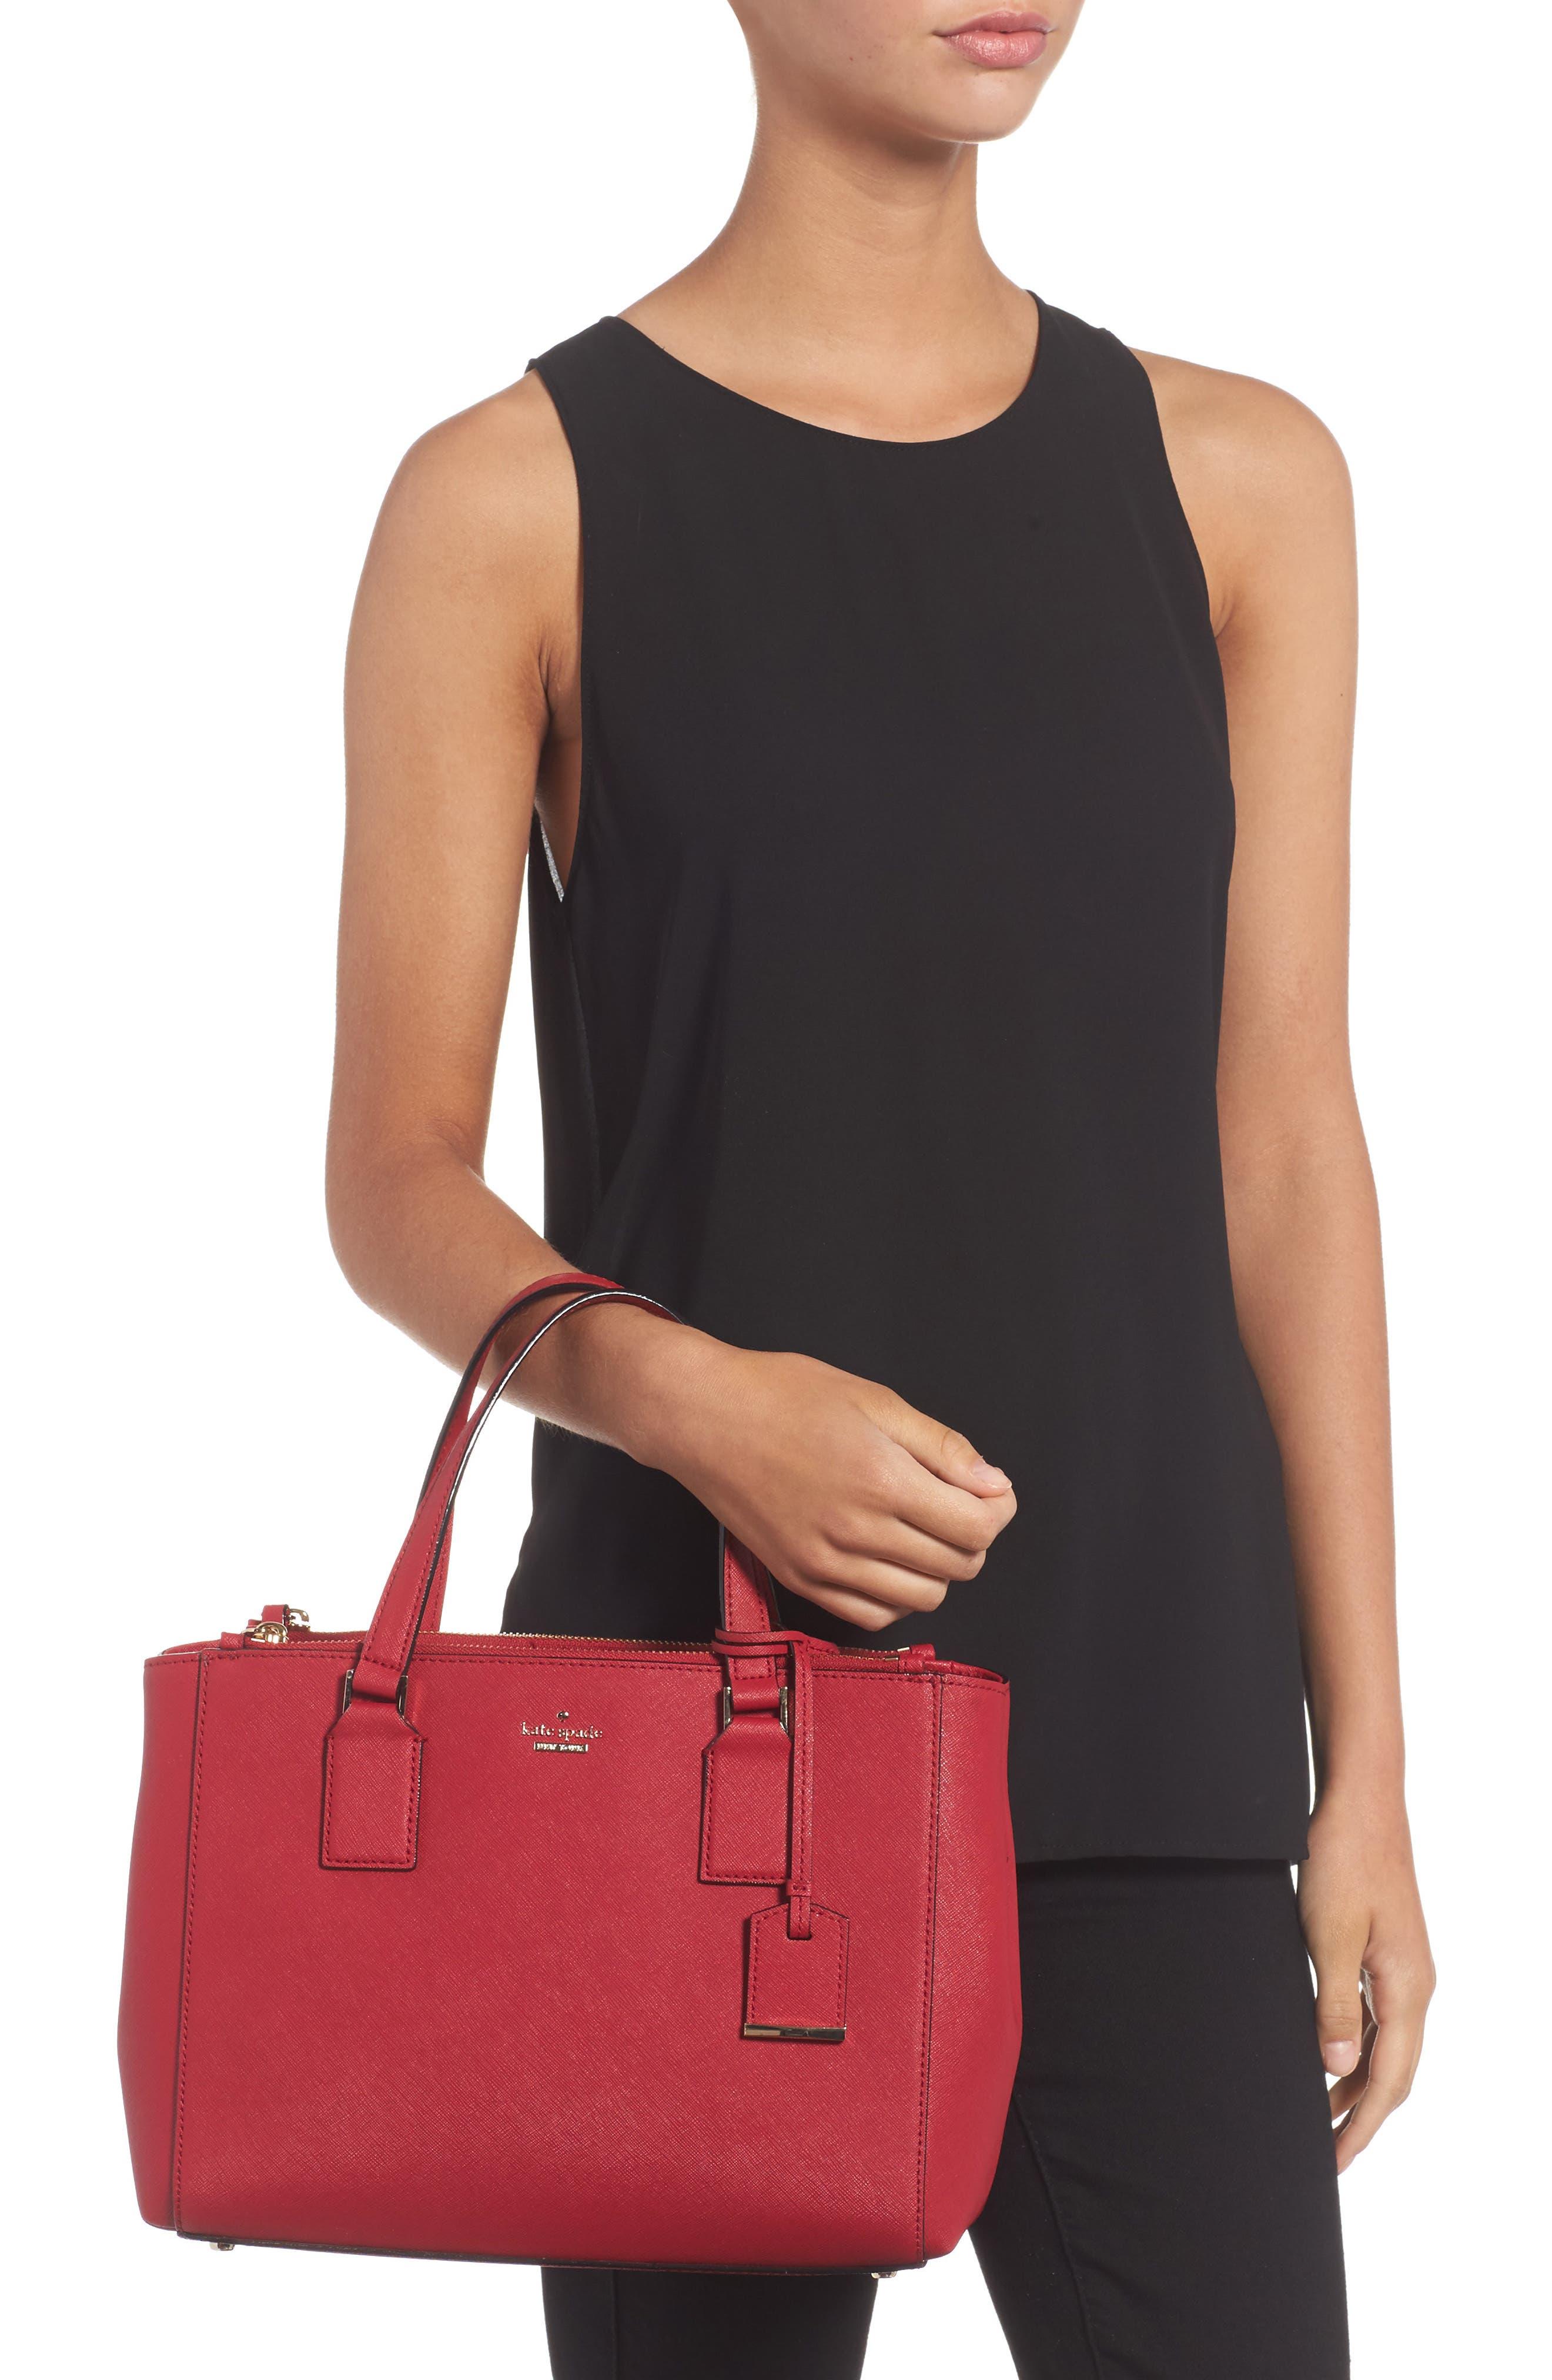 cameron street - teegan calfskin leather satchel,                             Alternate thumbnail 2, color,                             638